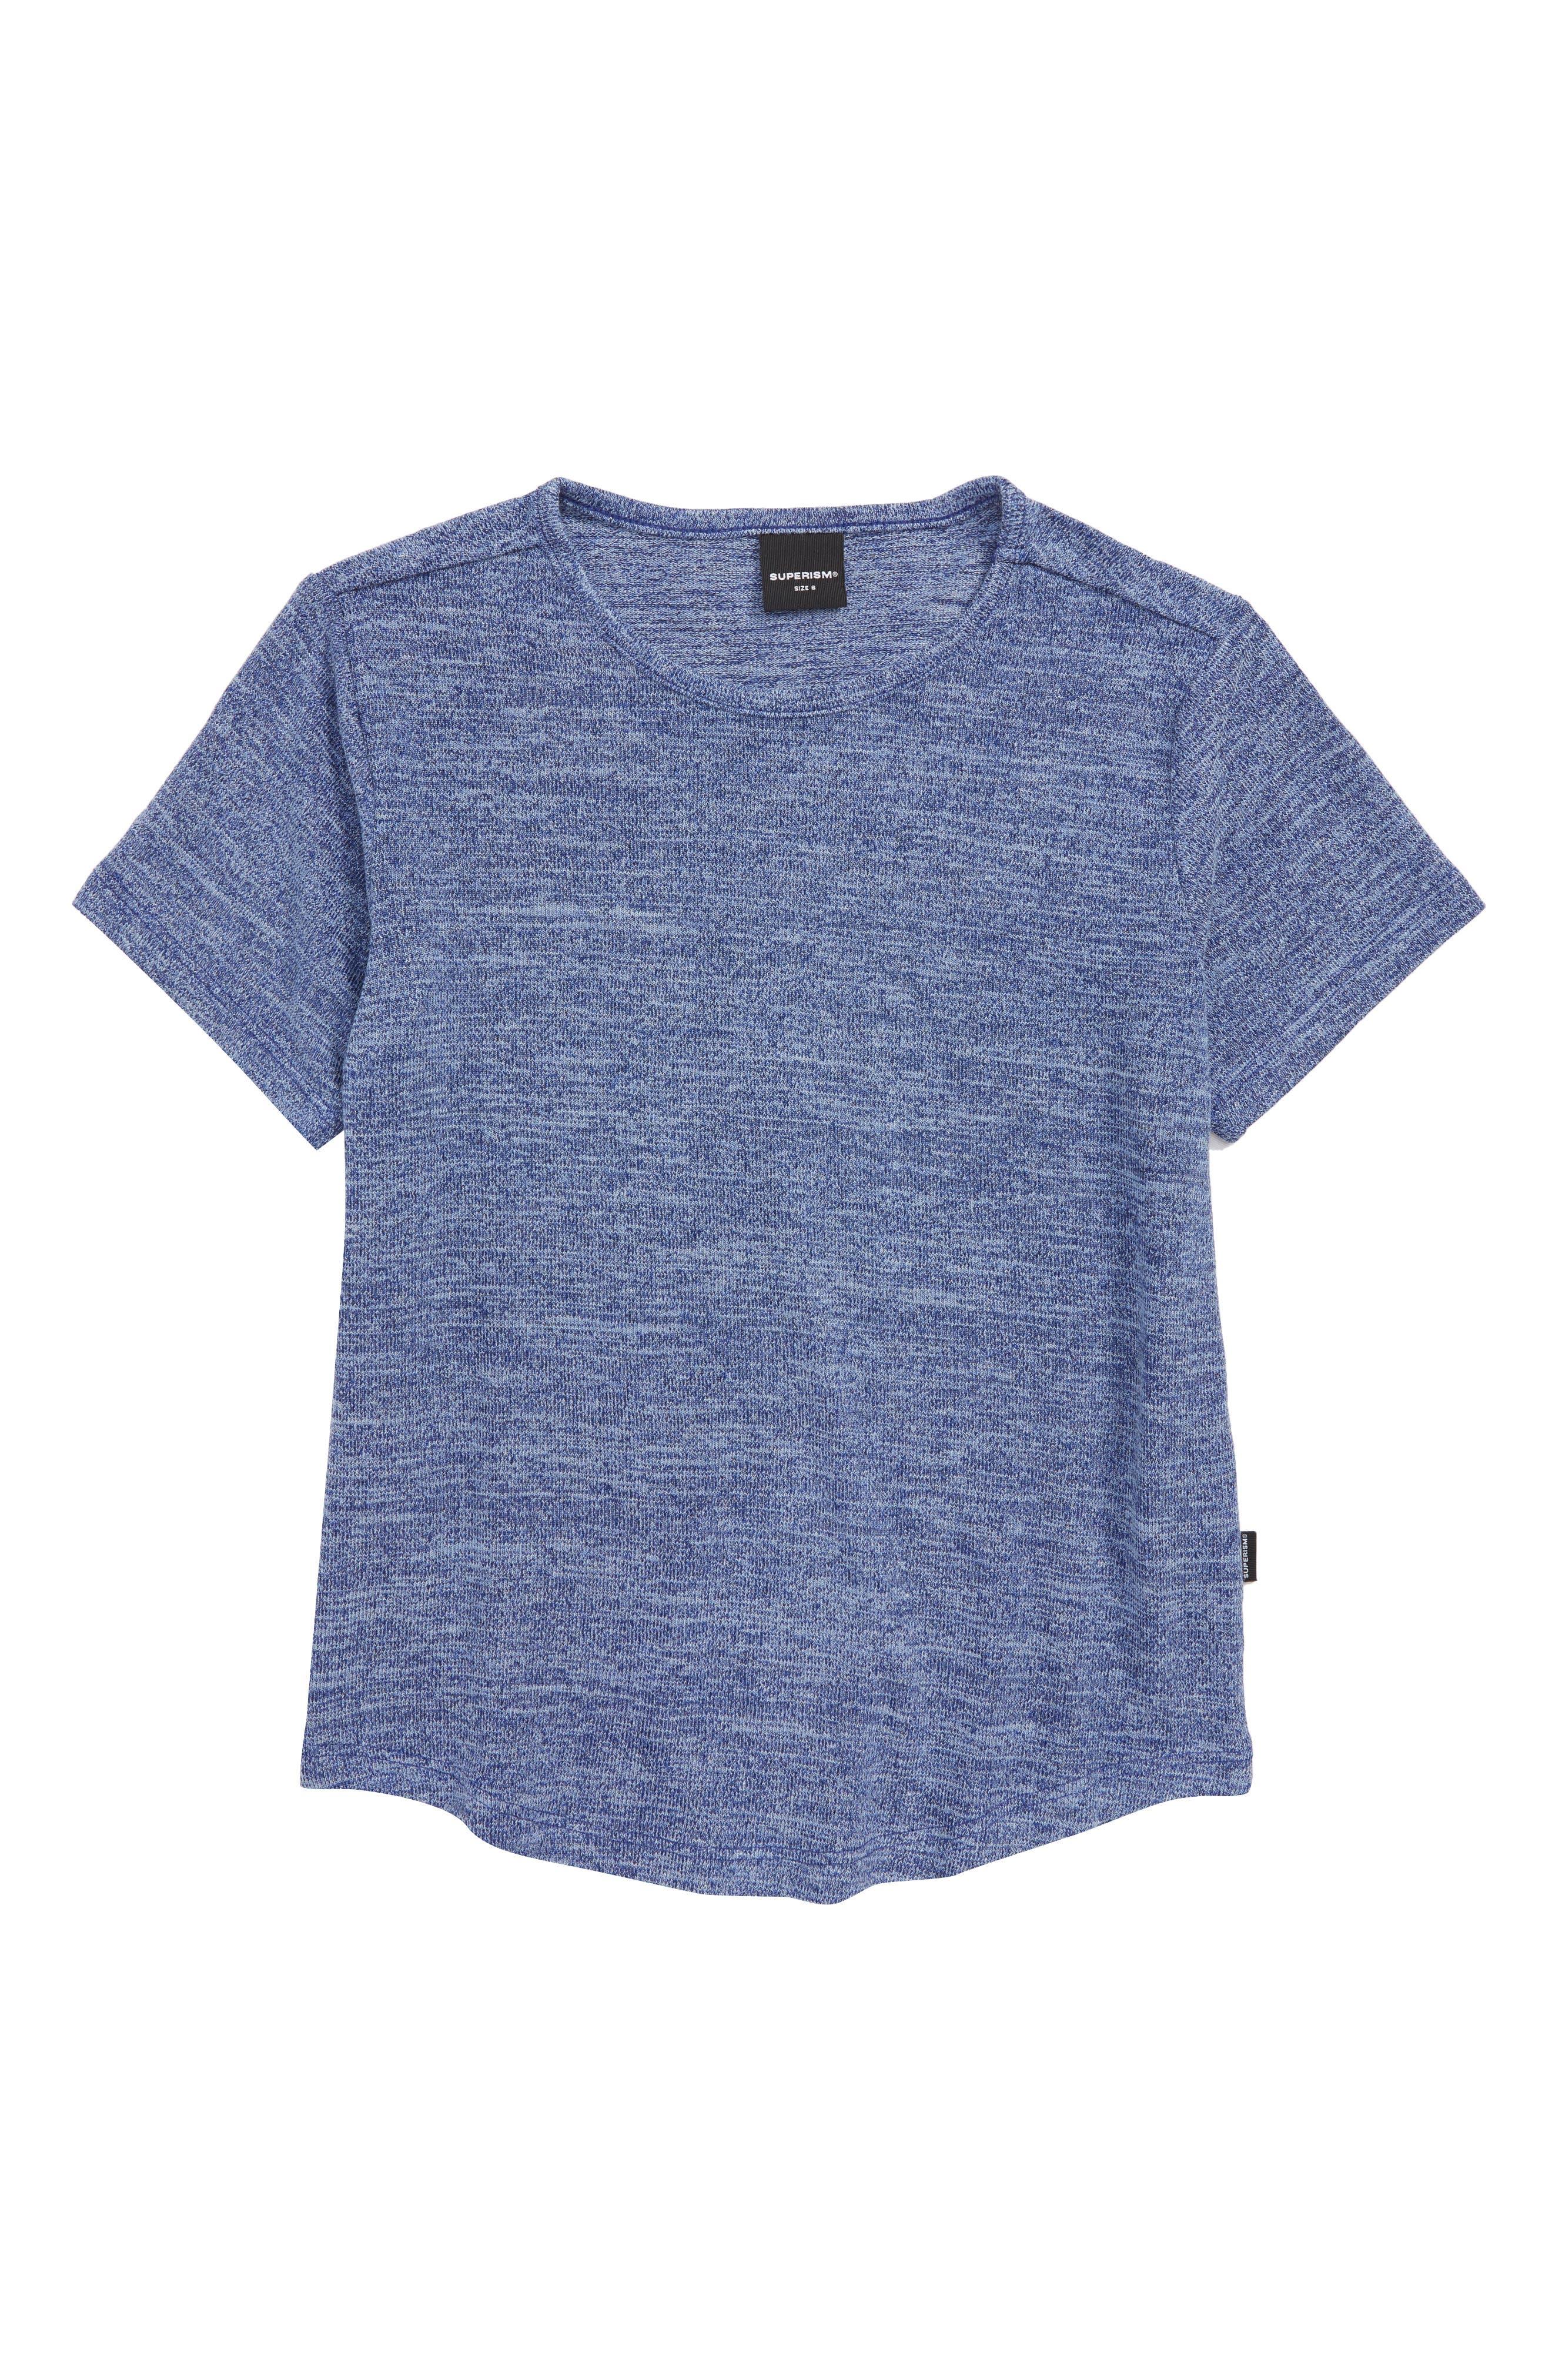 Landon Stretch T-Shirt,                             Main thumbnail 1, color,                             BLUE